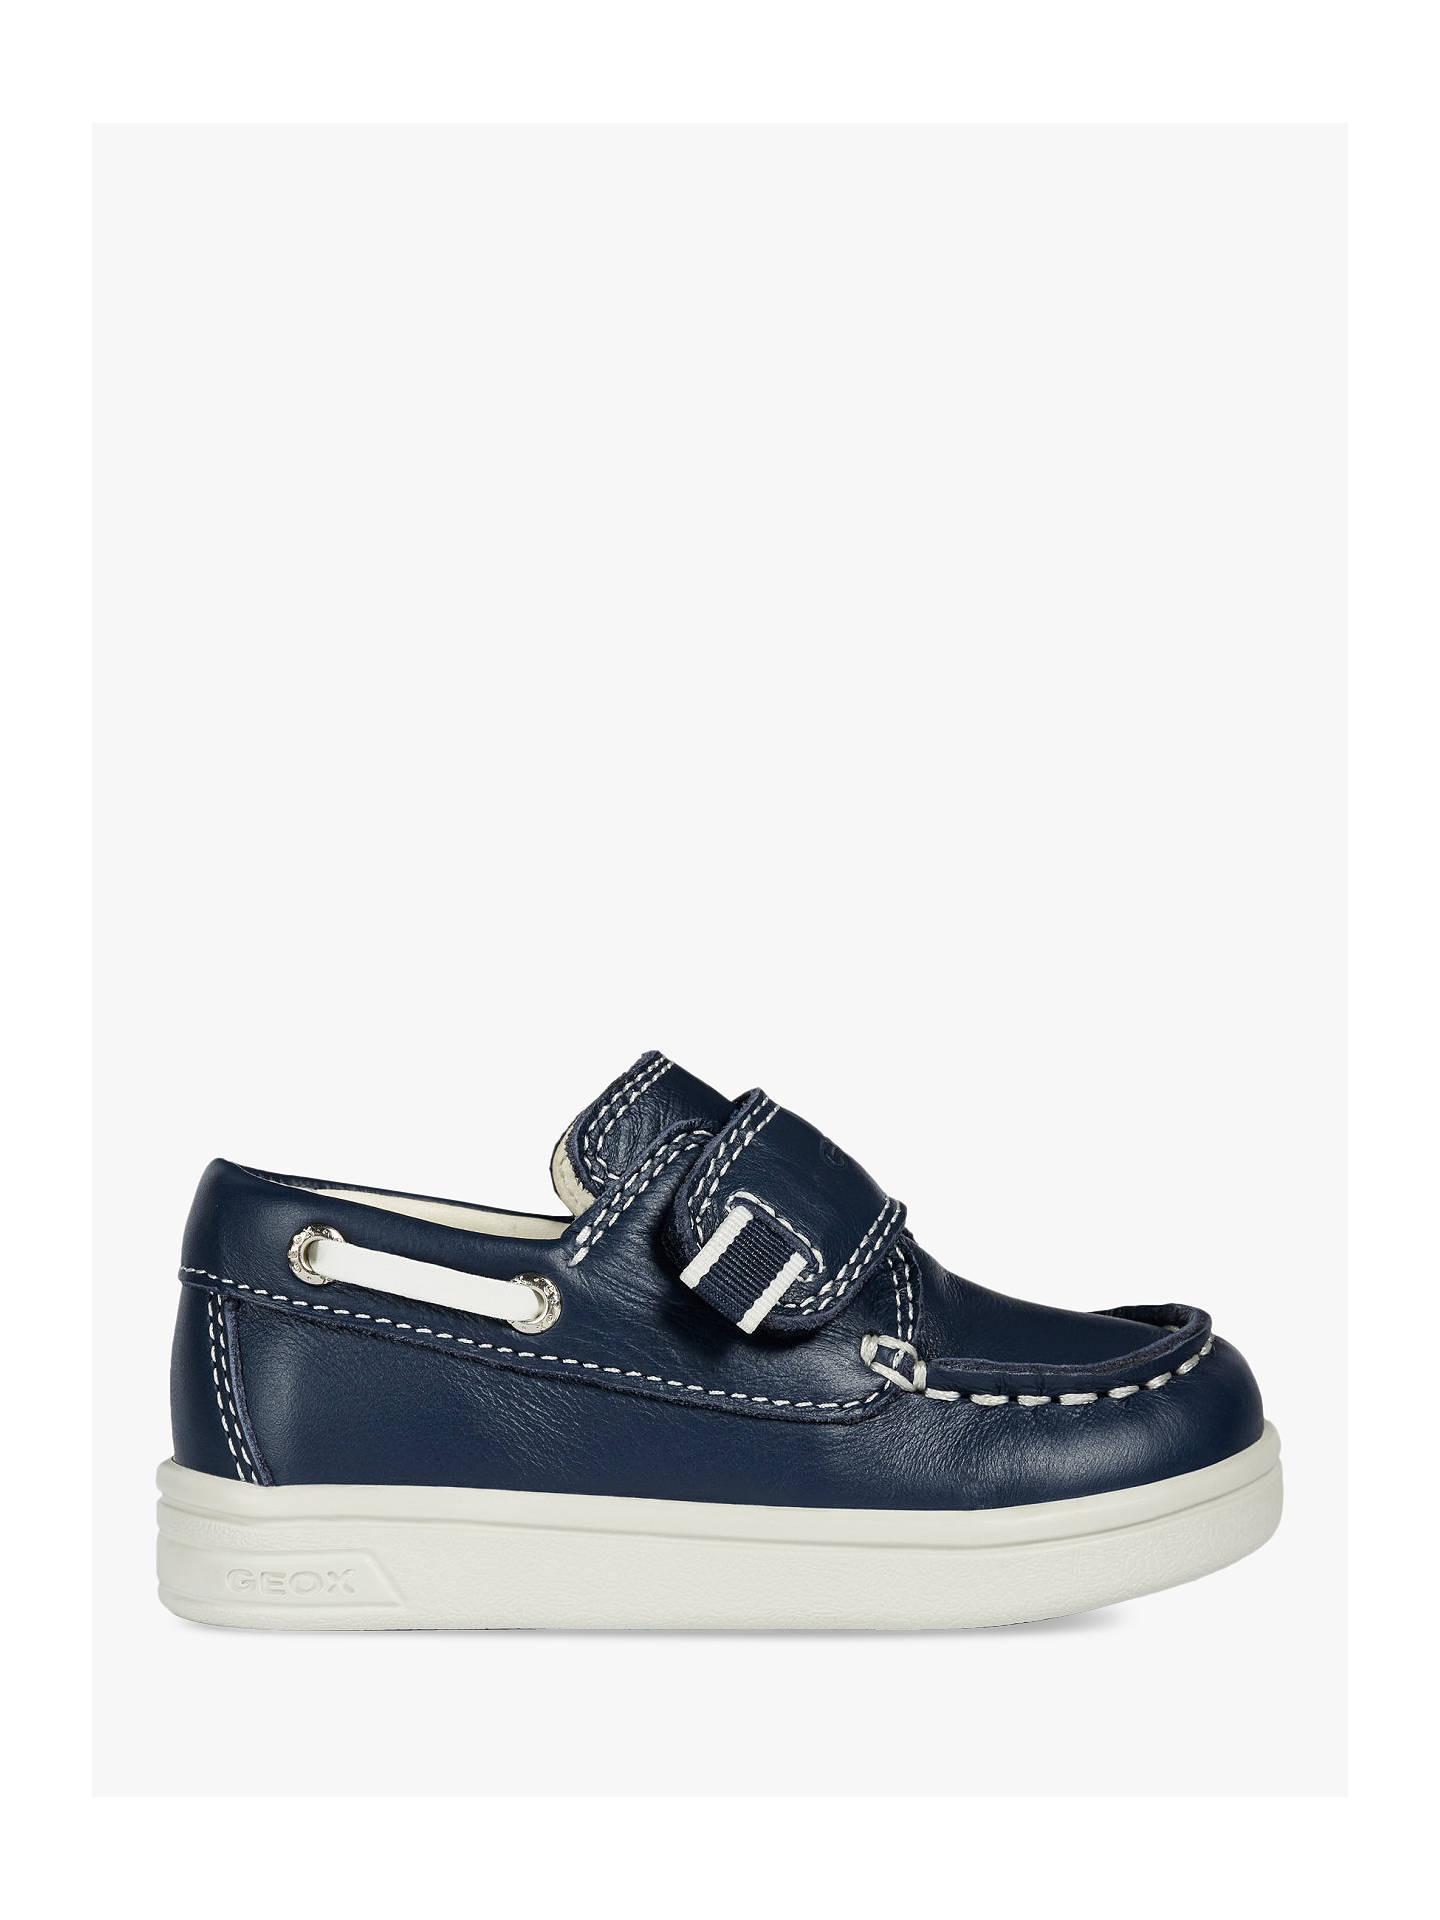 312bbe4c969 Buy Geox Children's DJ Rock Boat Shoes, Navy, 21 Online at johnlewis. ...